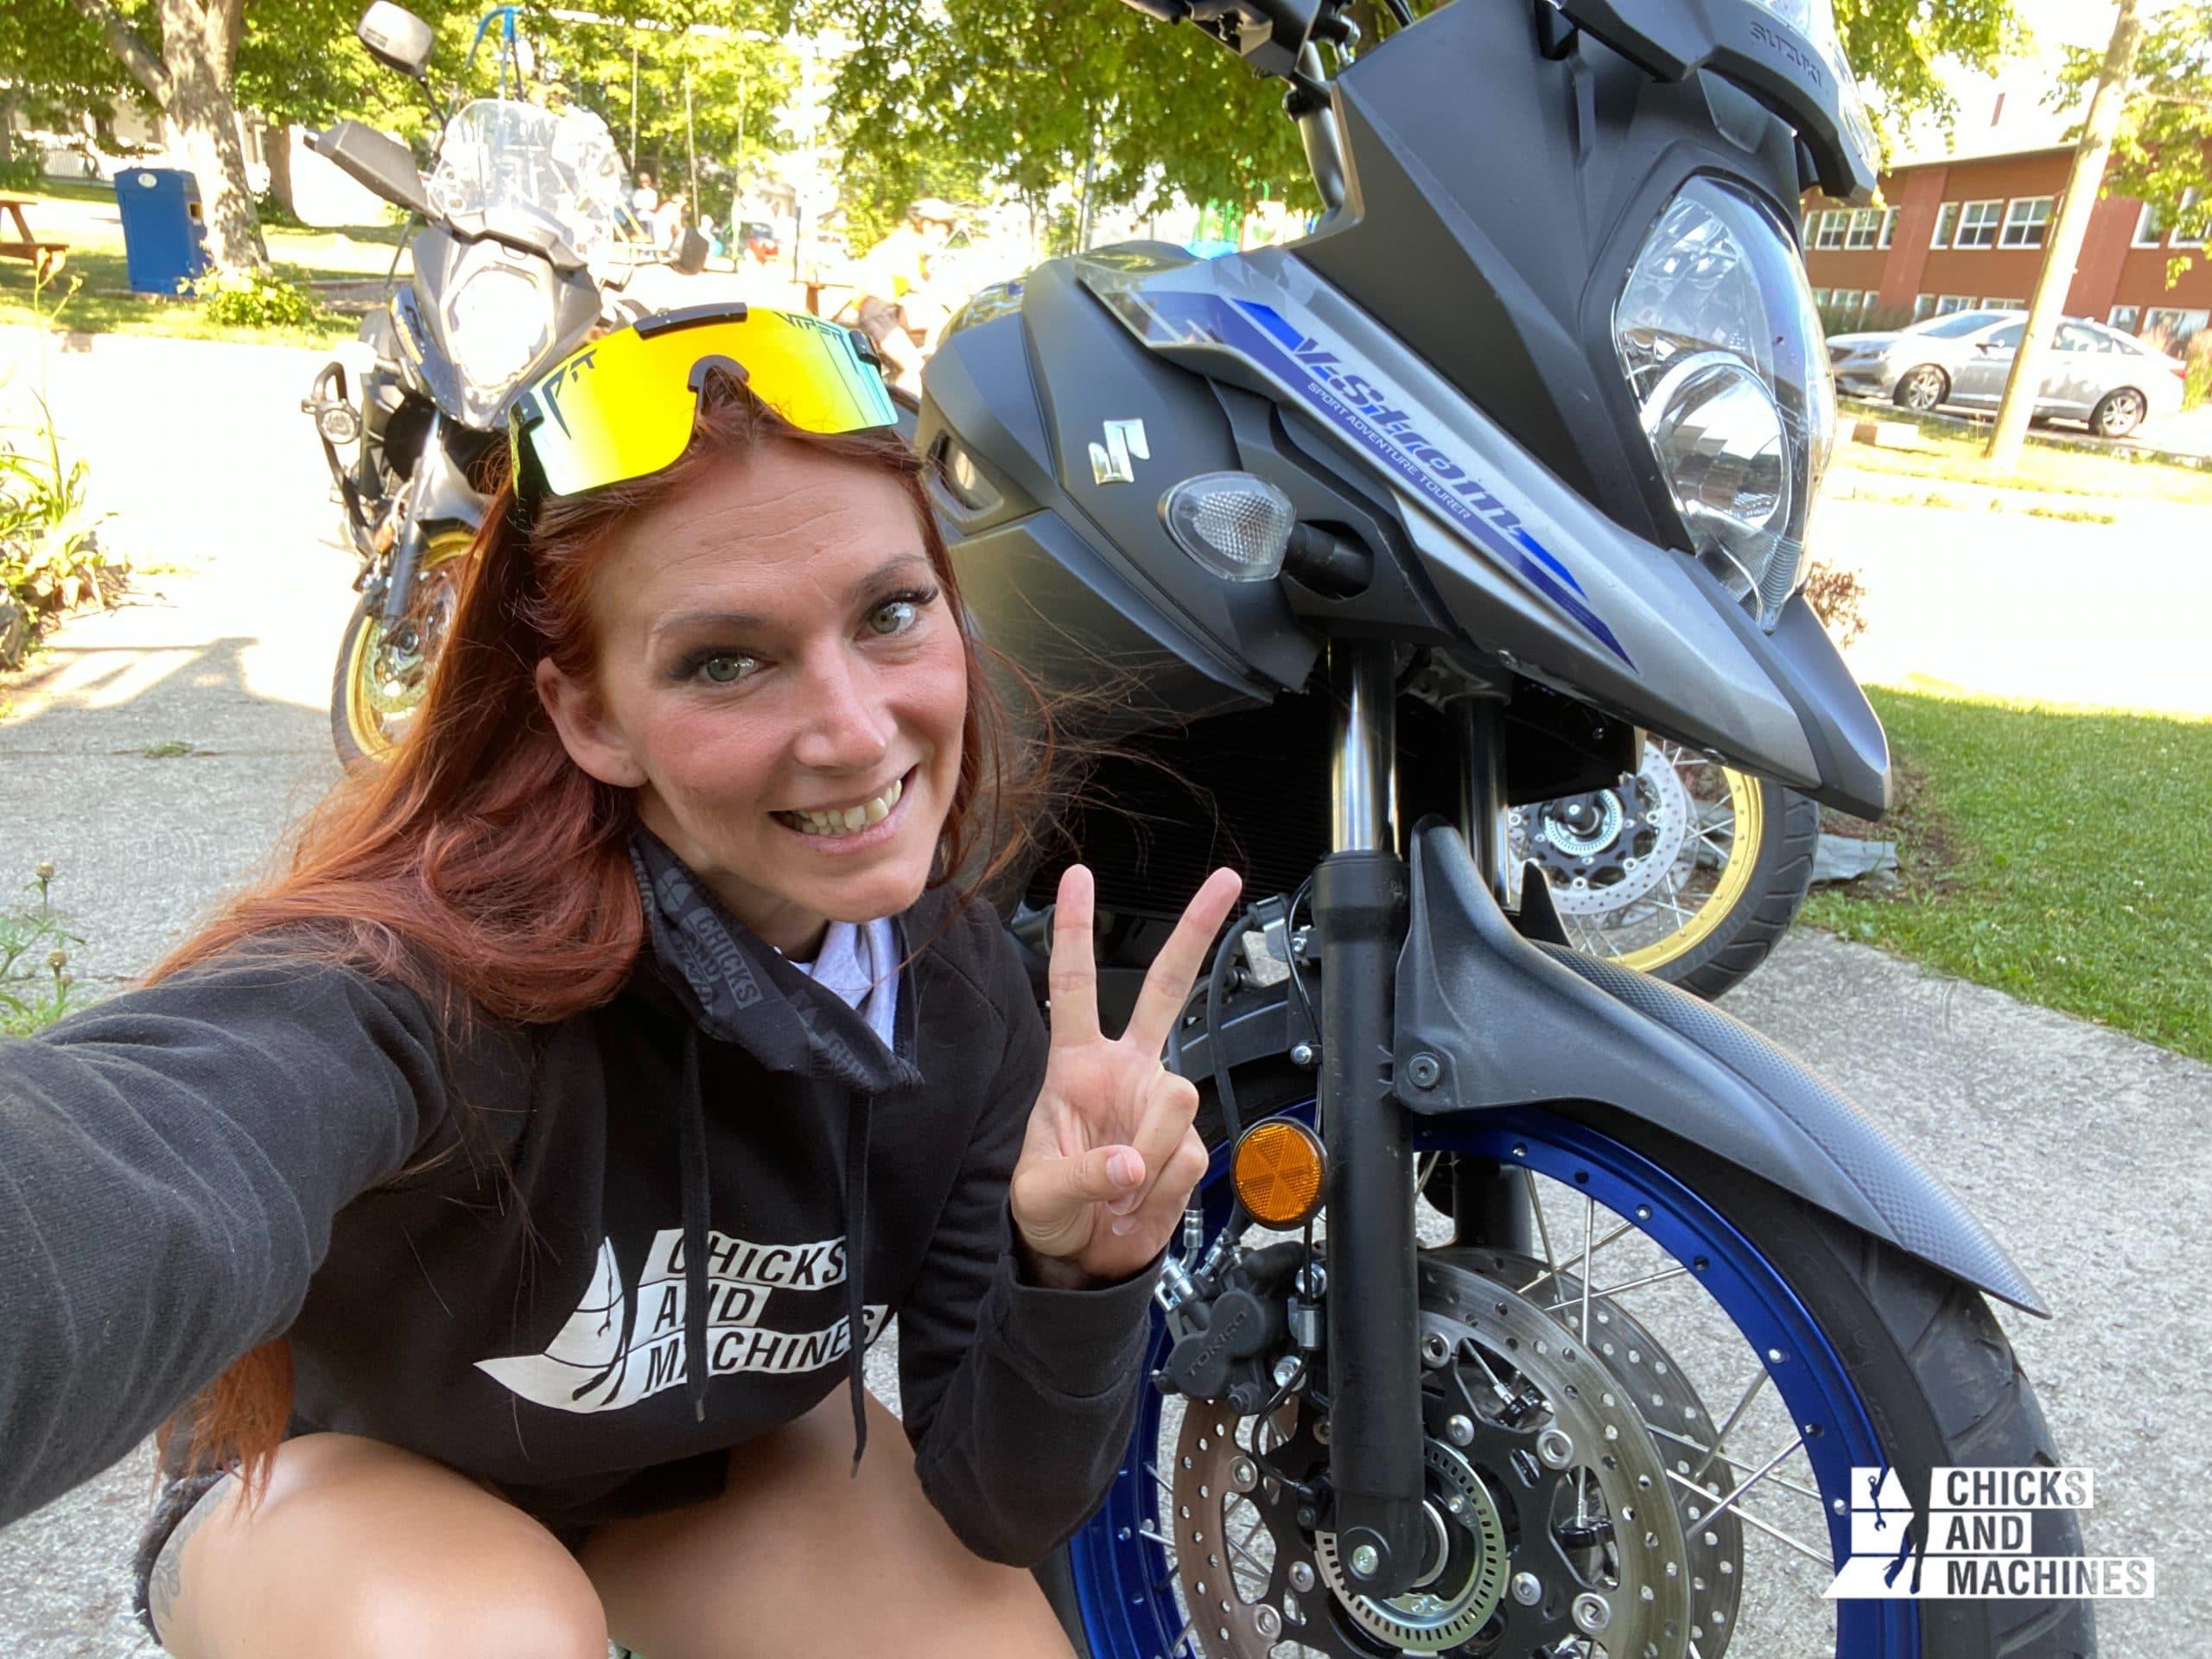 Caro changera-t-elle sa moto pour la V-Strom ? ;)